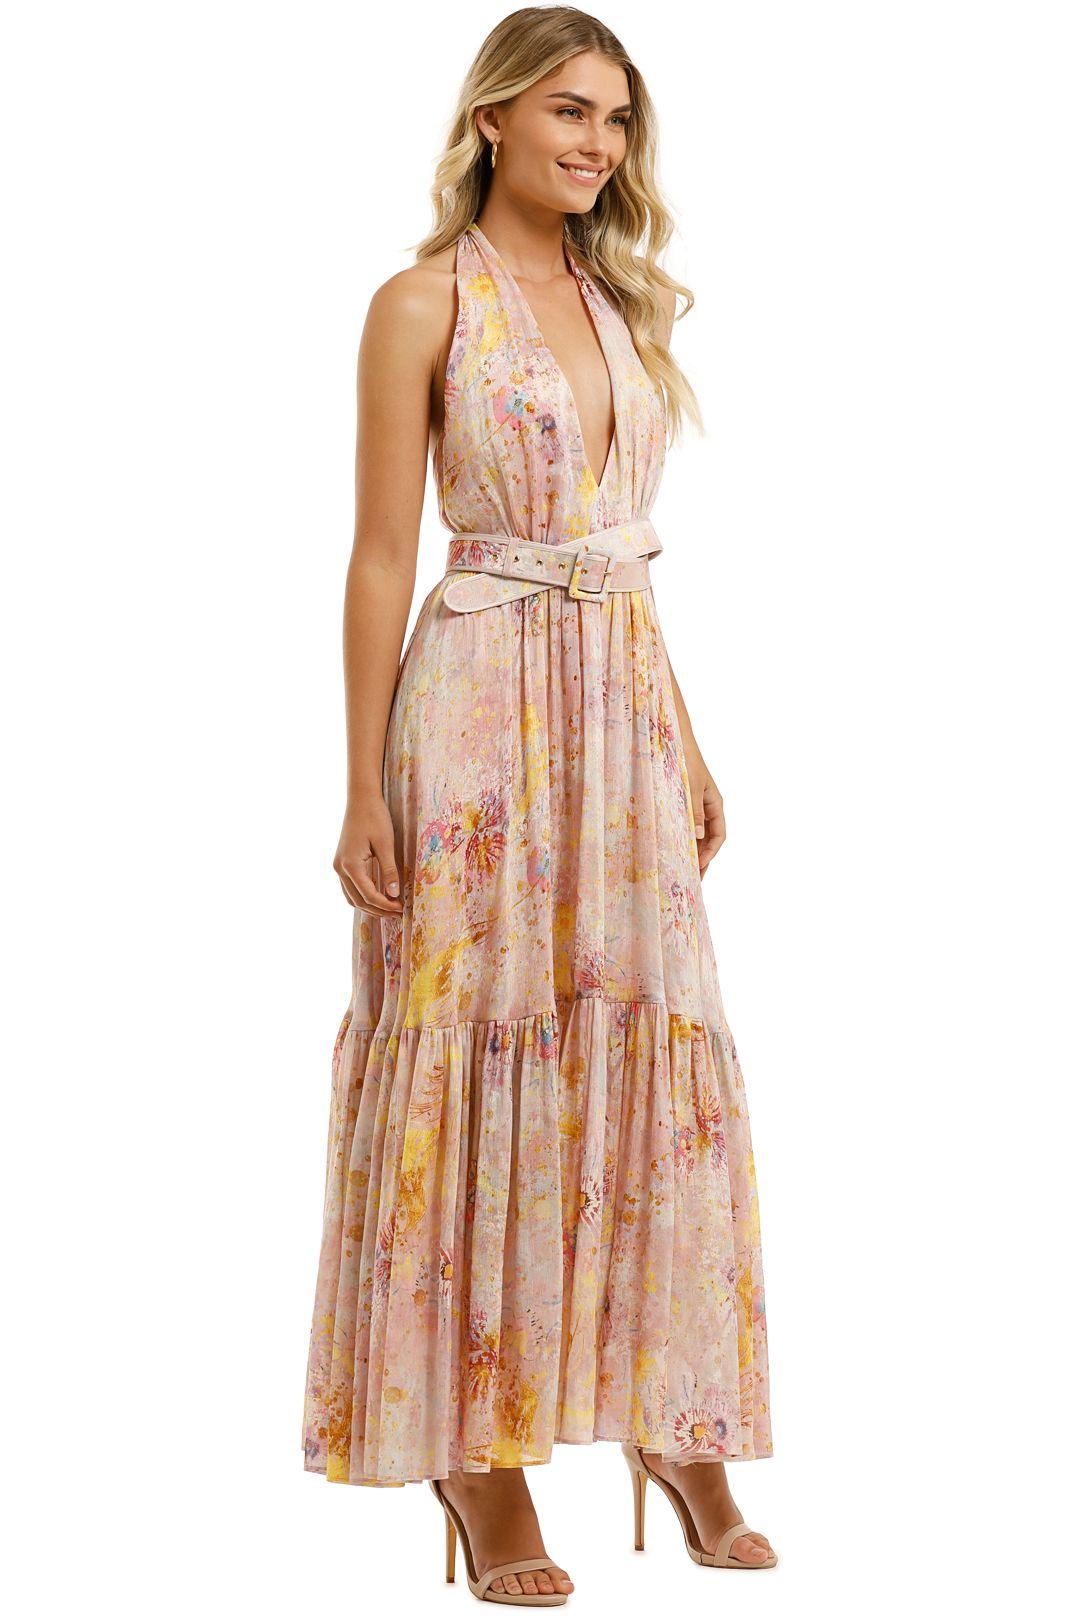 Leo-and-Lin-Adoration-Silk-Linen-Dress-Blush-Side